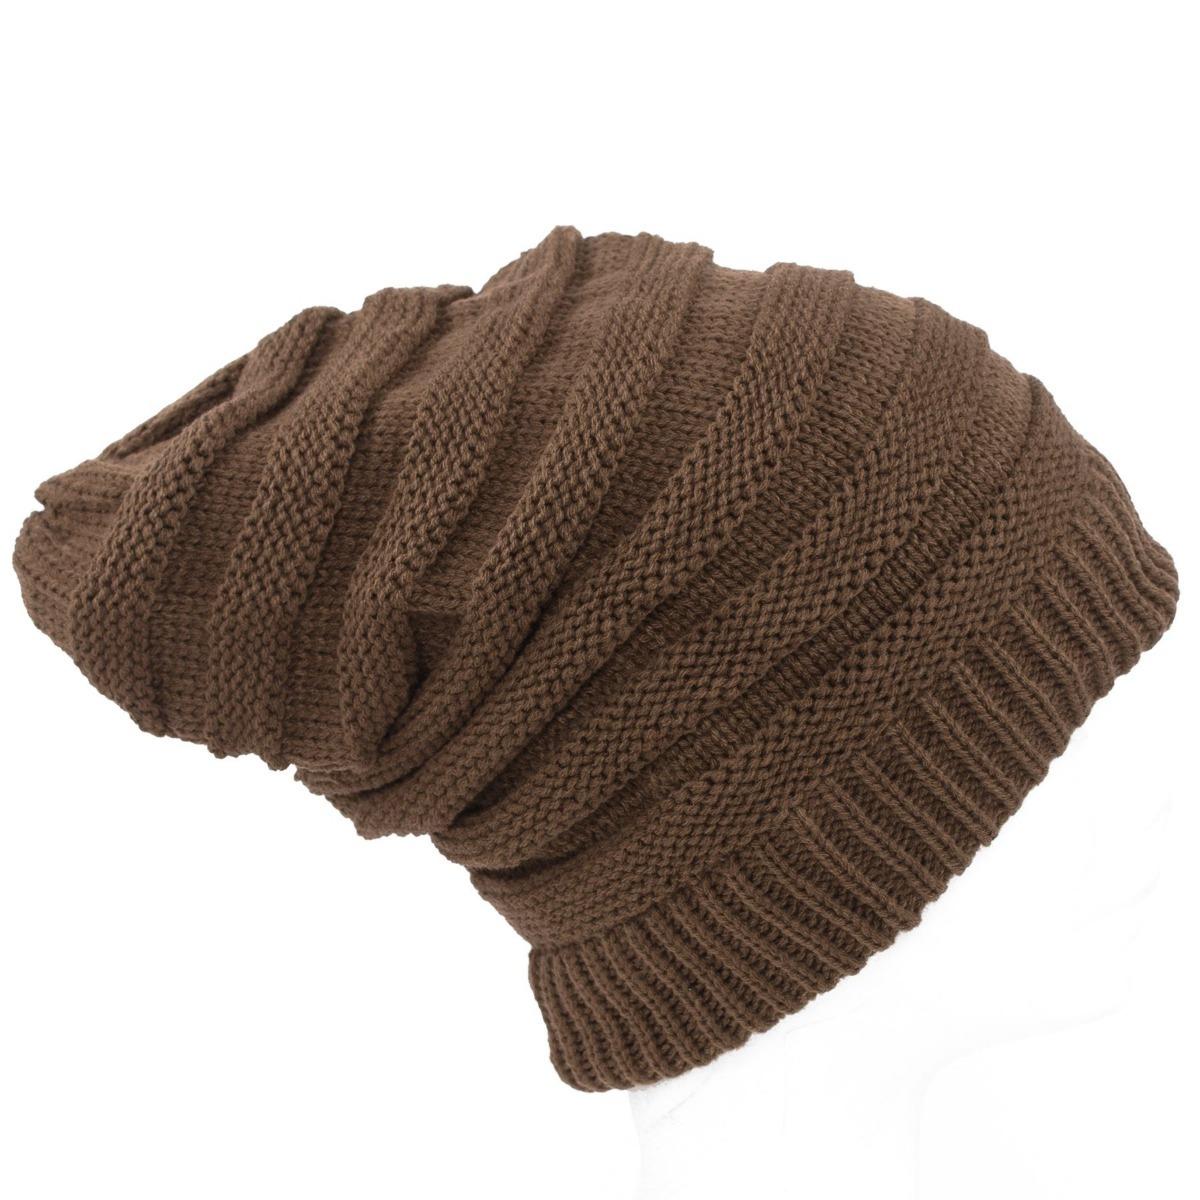 gorros de lana caidos beanie moda unisex color chocolate. Cargando zoom. db01fd4ac36